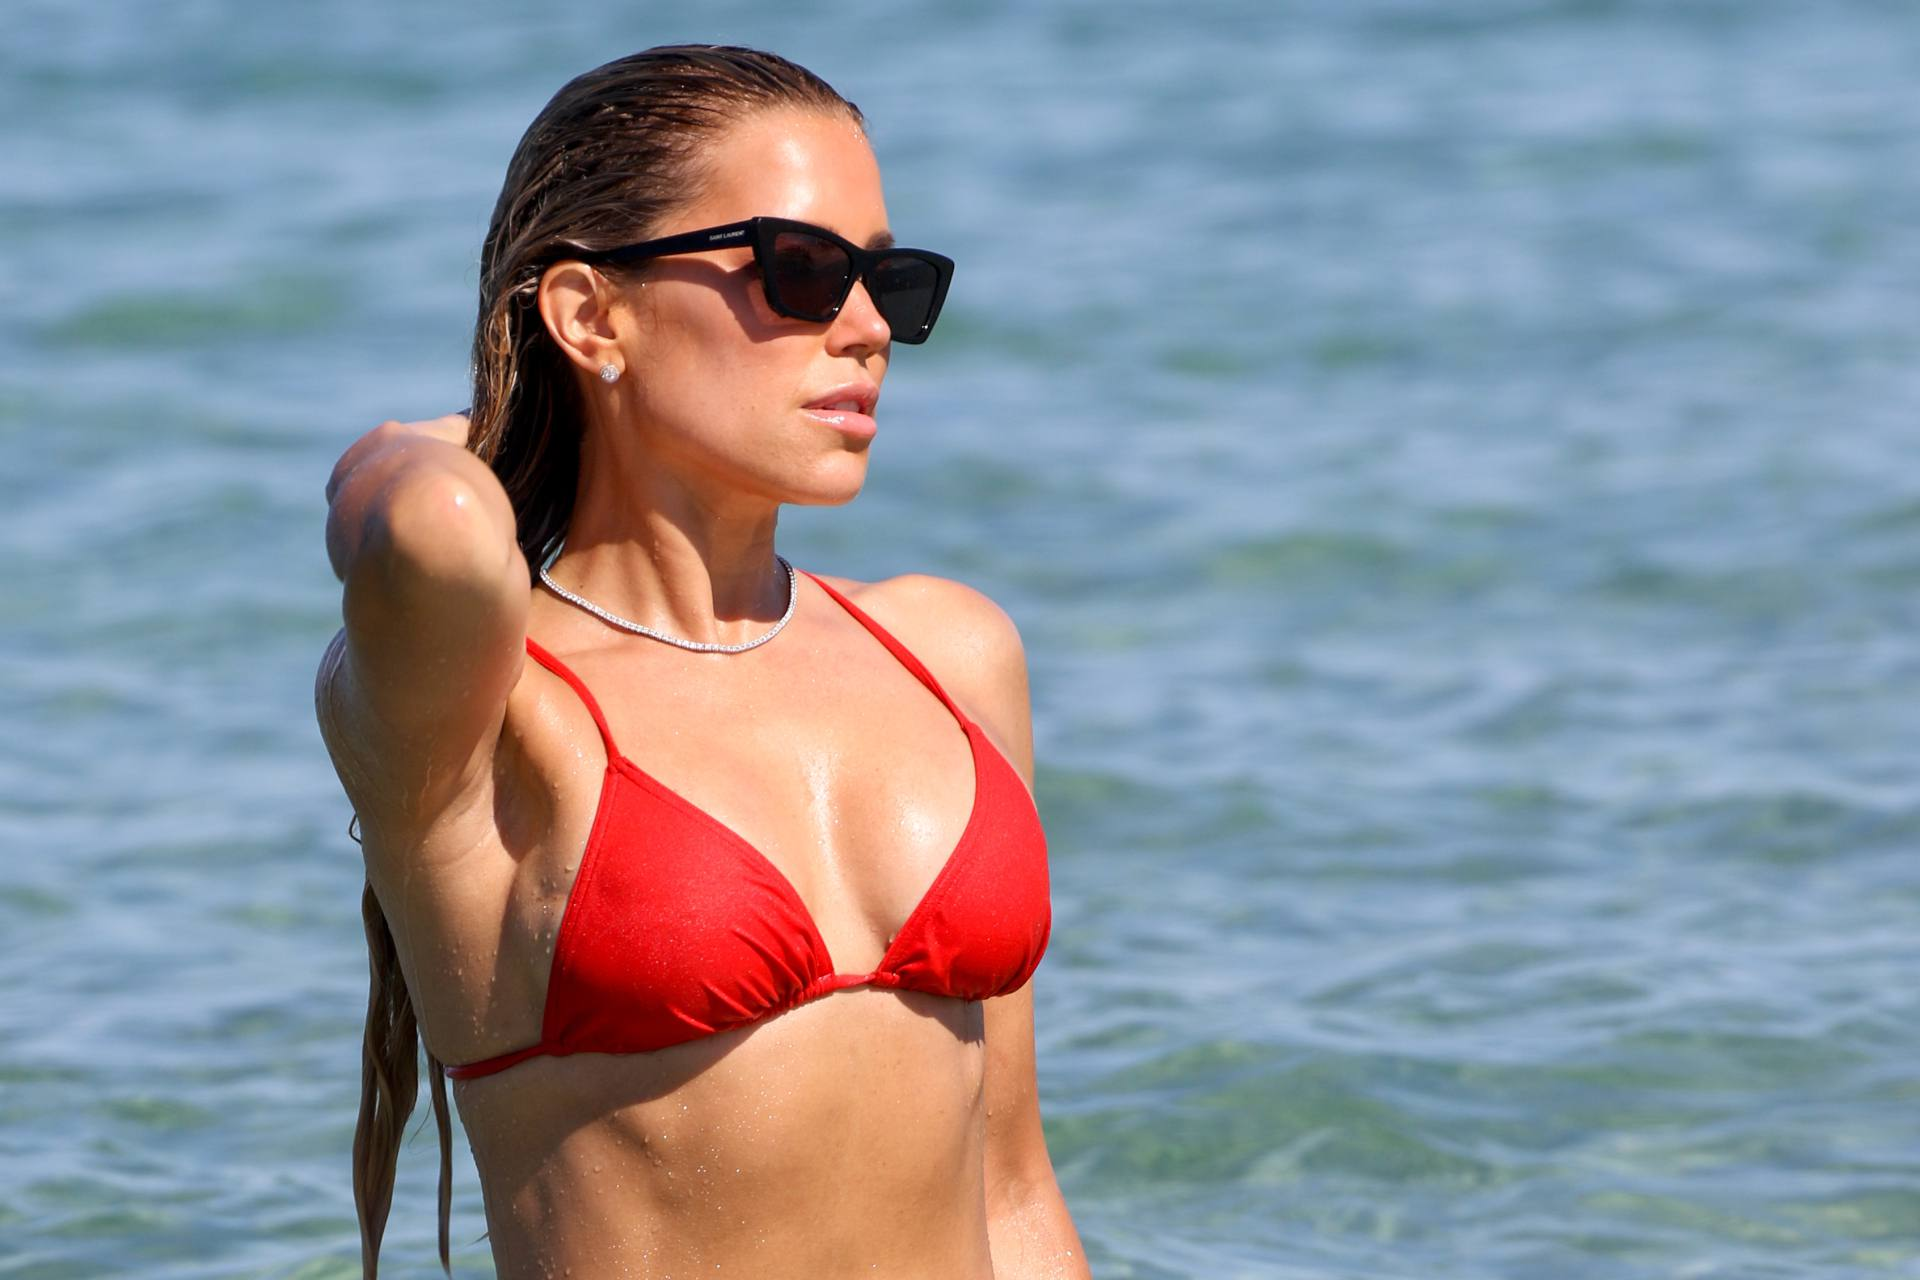 Sylvie Meis – Beautiful Body In Sexy Bikini On The Beach In Saint Tropez 0015